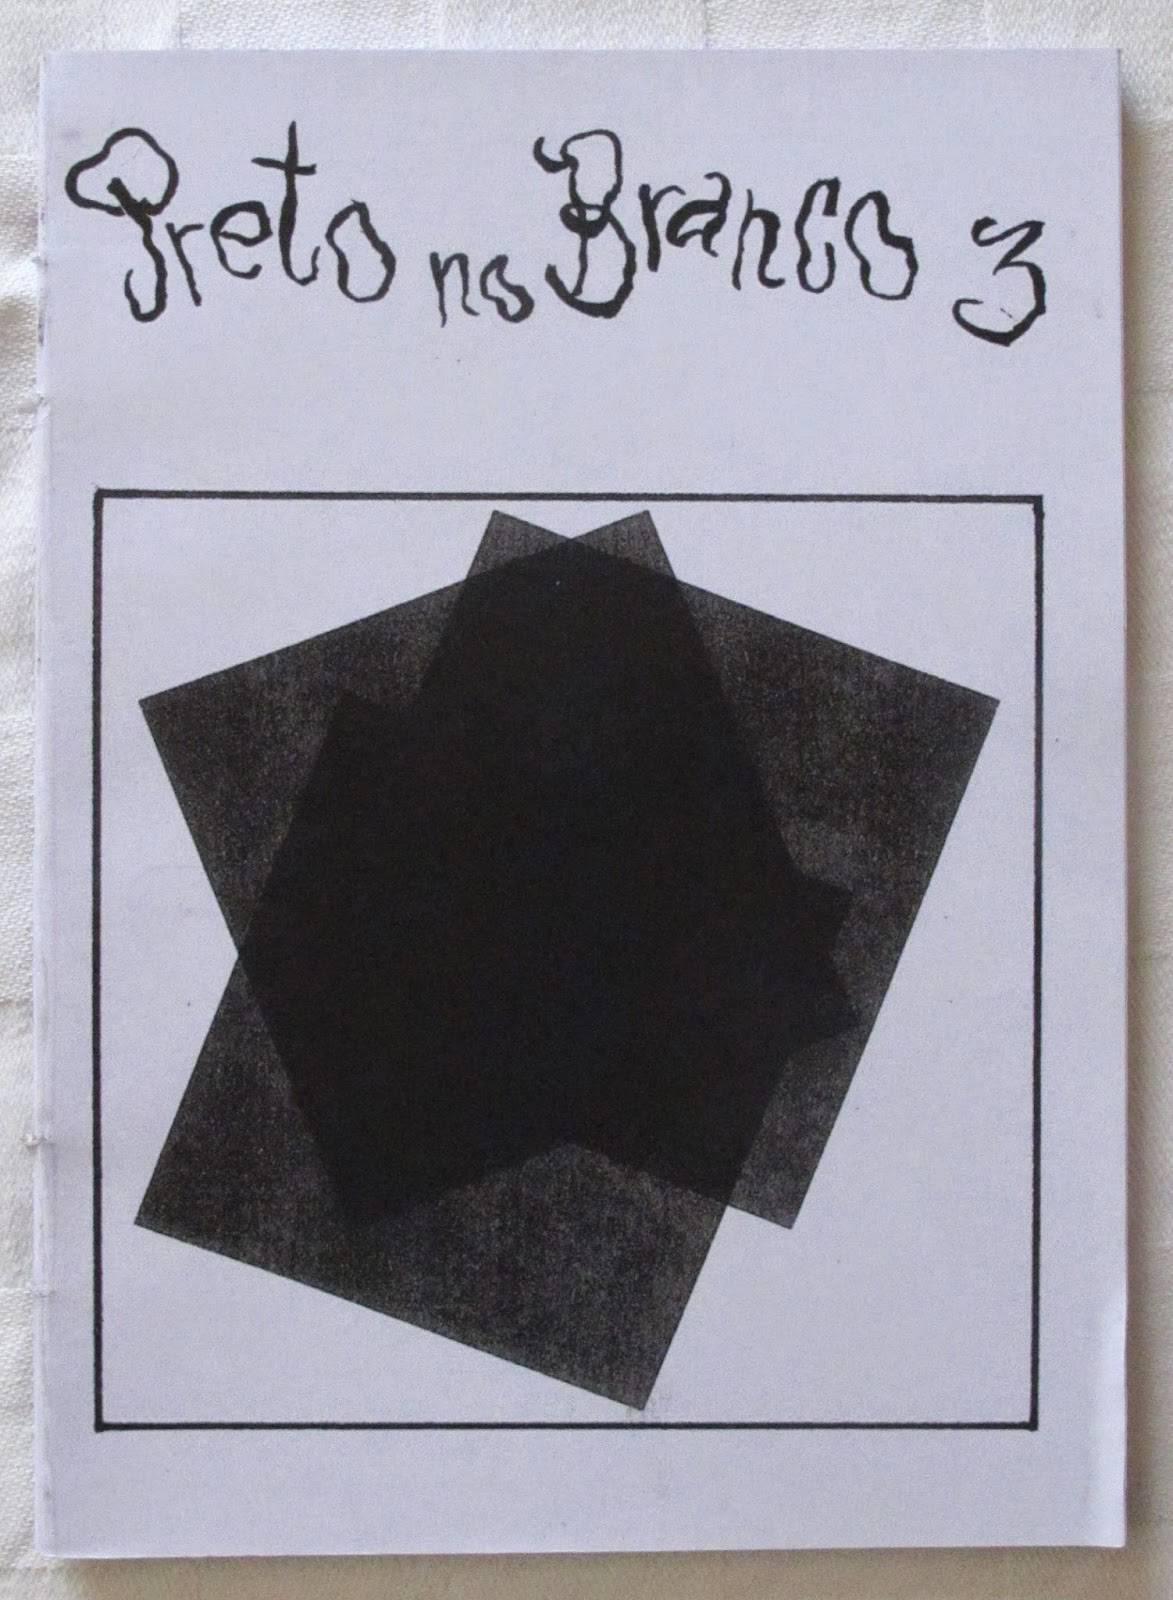 pretonobranco3